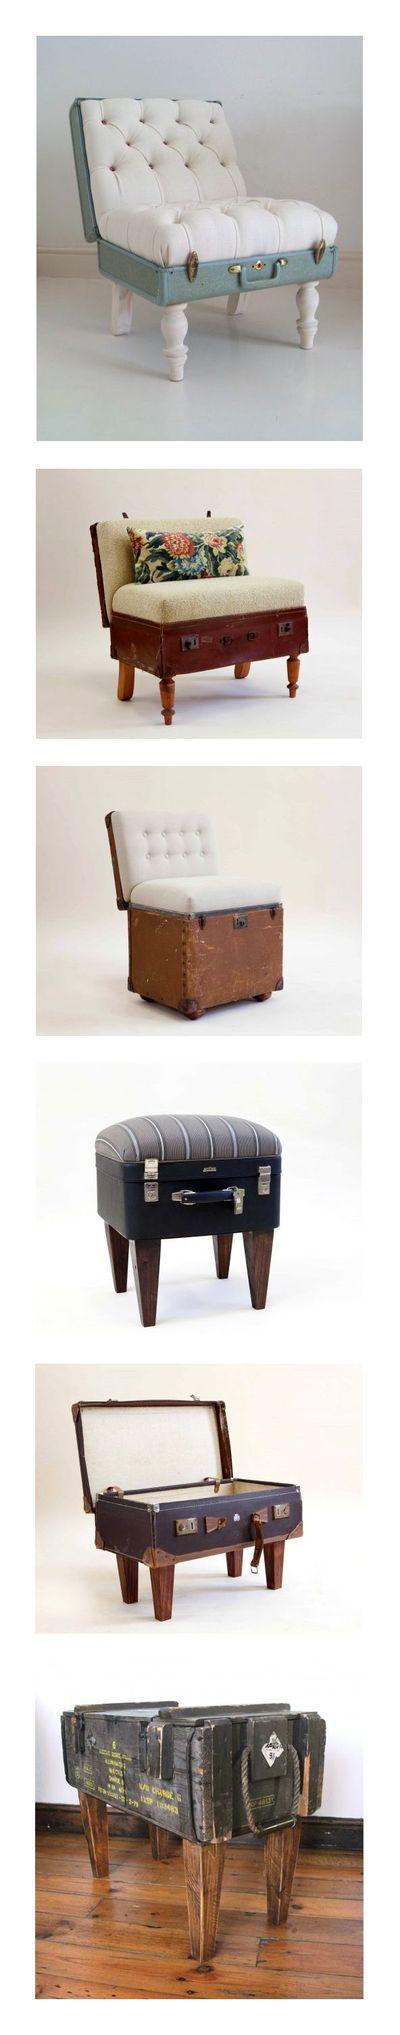 Vintage-Suitcases-interior-34